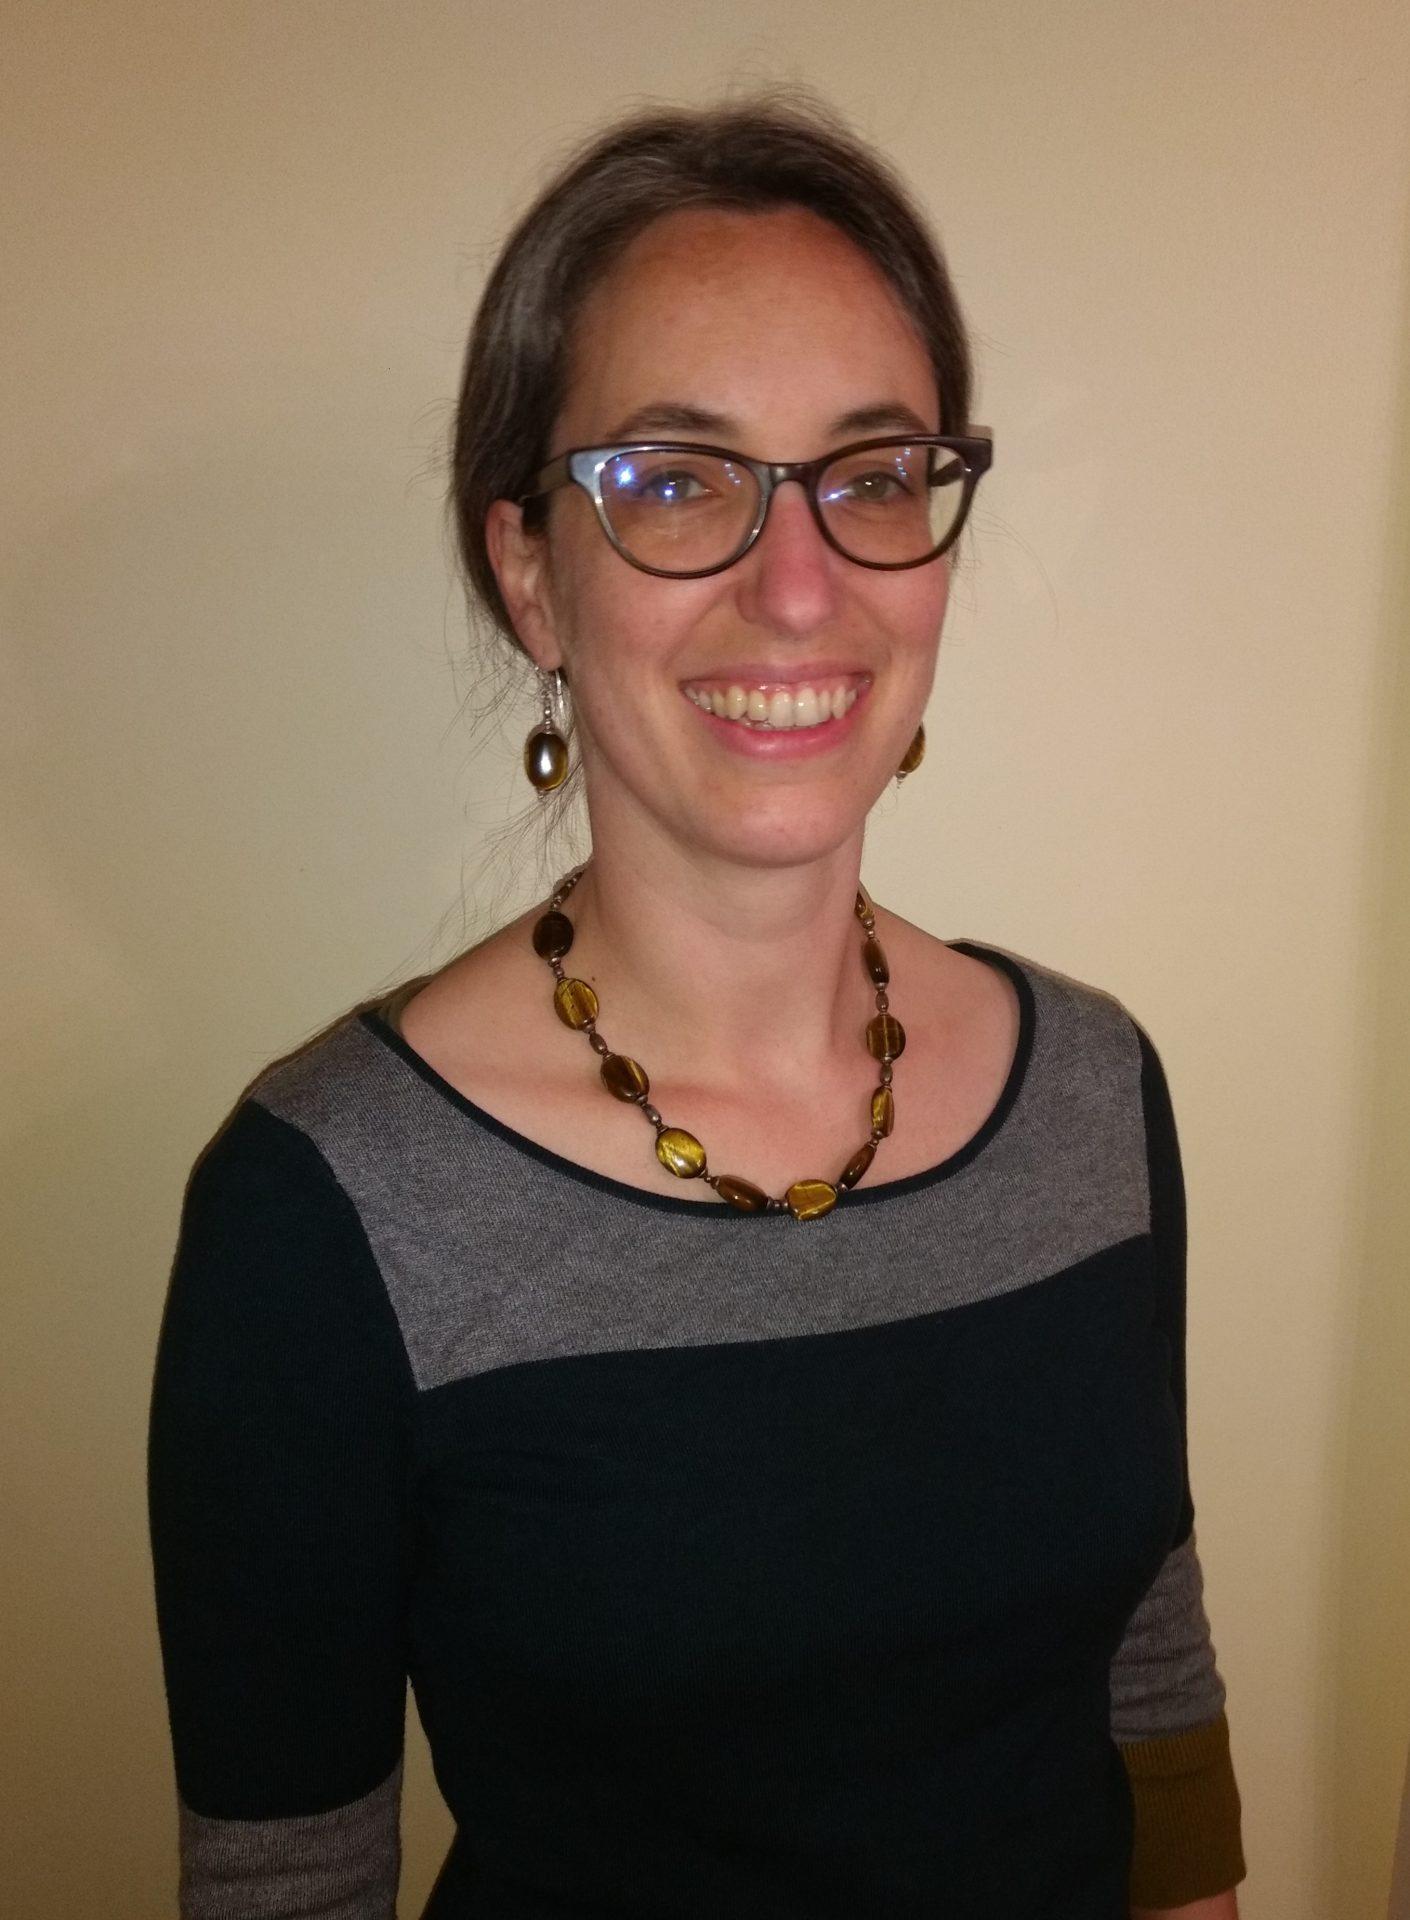 Marie-Andrée Papineau, C.Hyp™ Practitioner